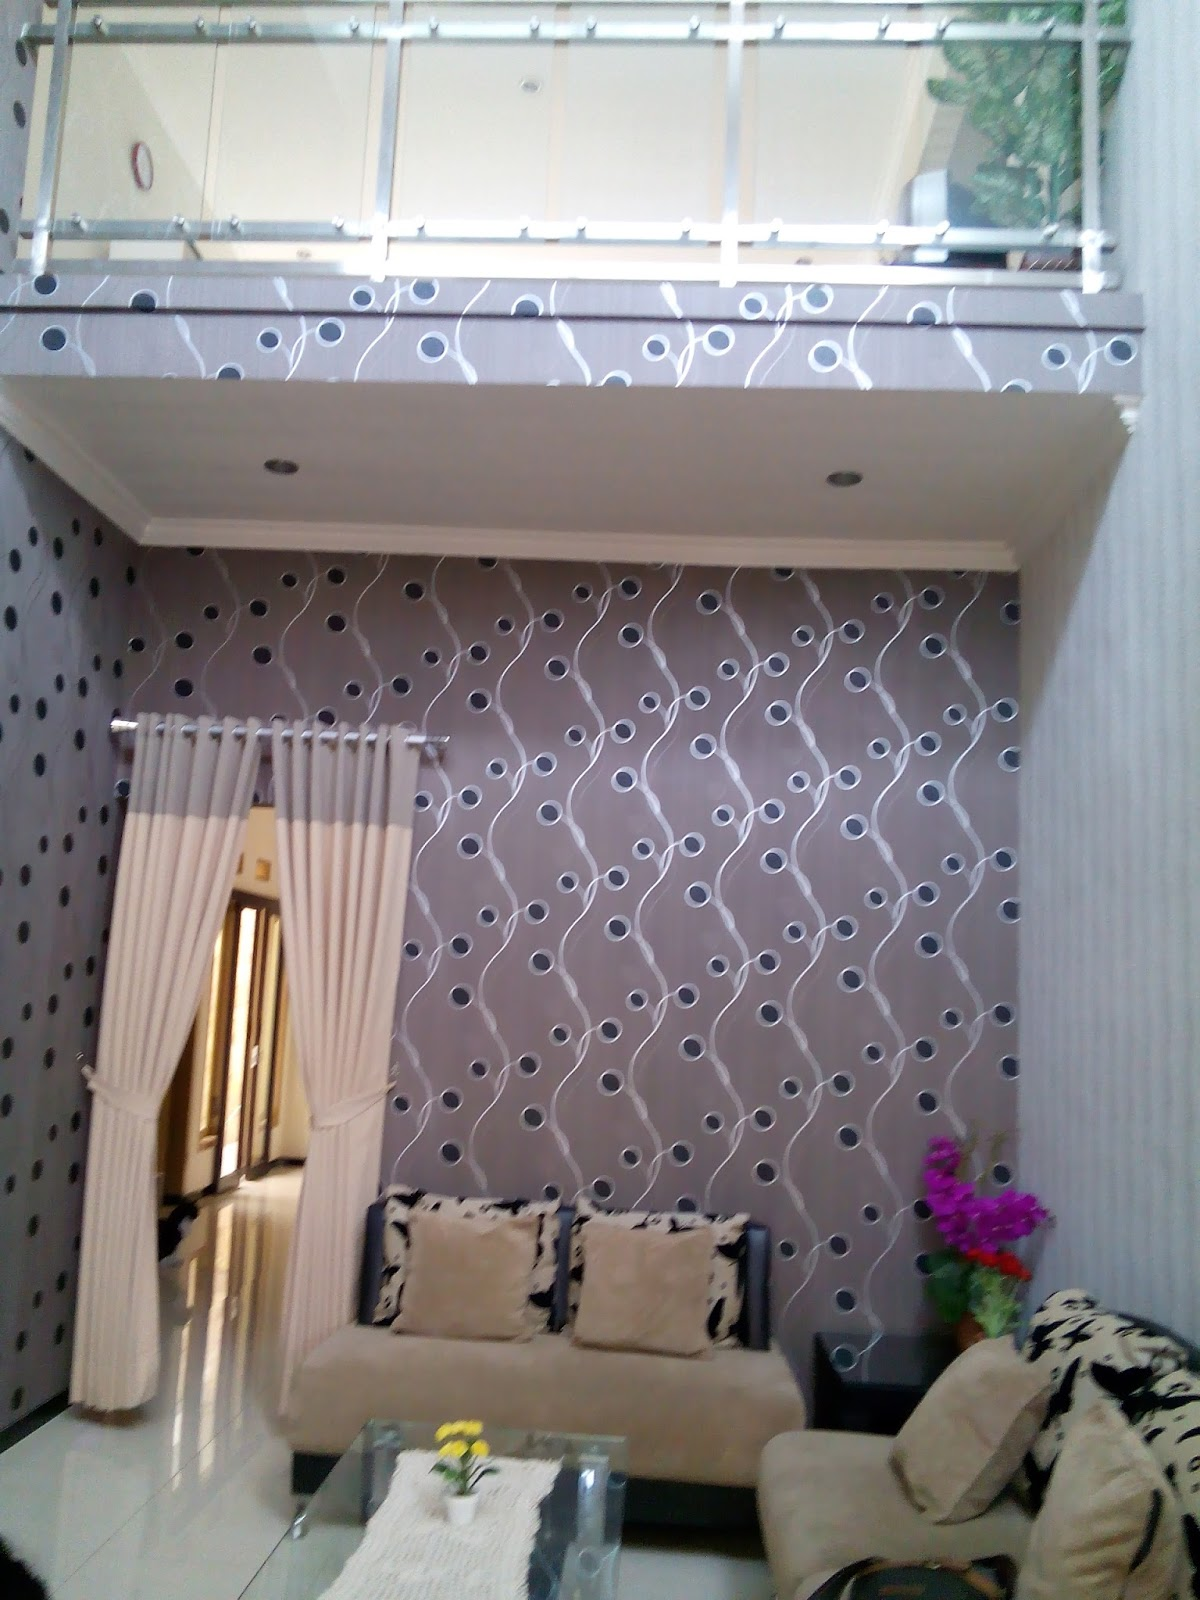 082132673033 Wallpaper Dinding Malang Wallpaper